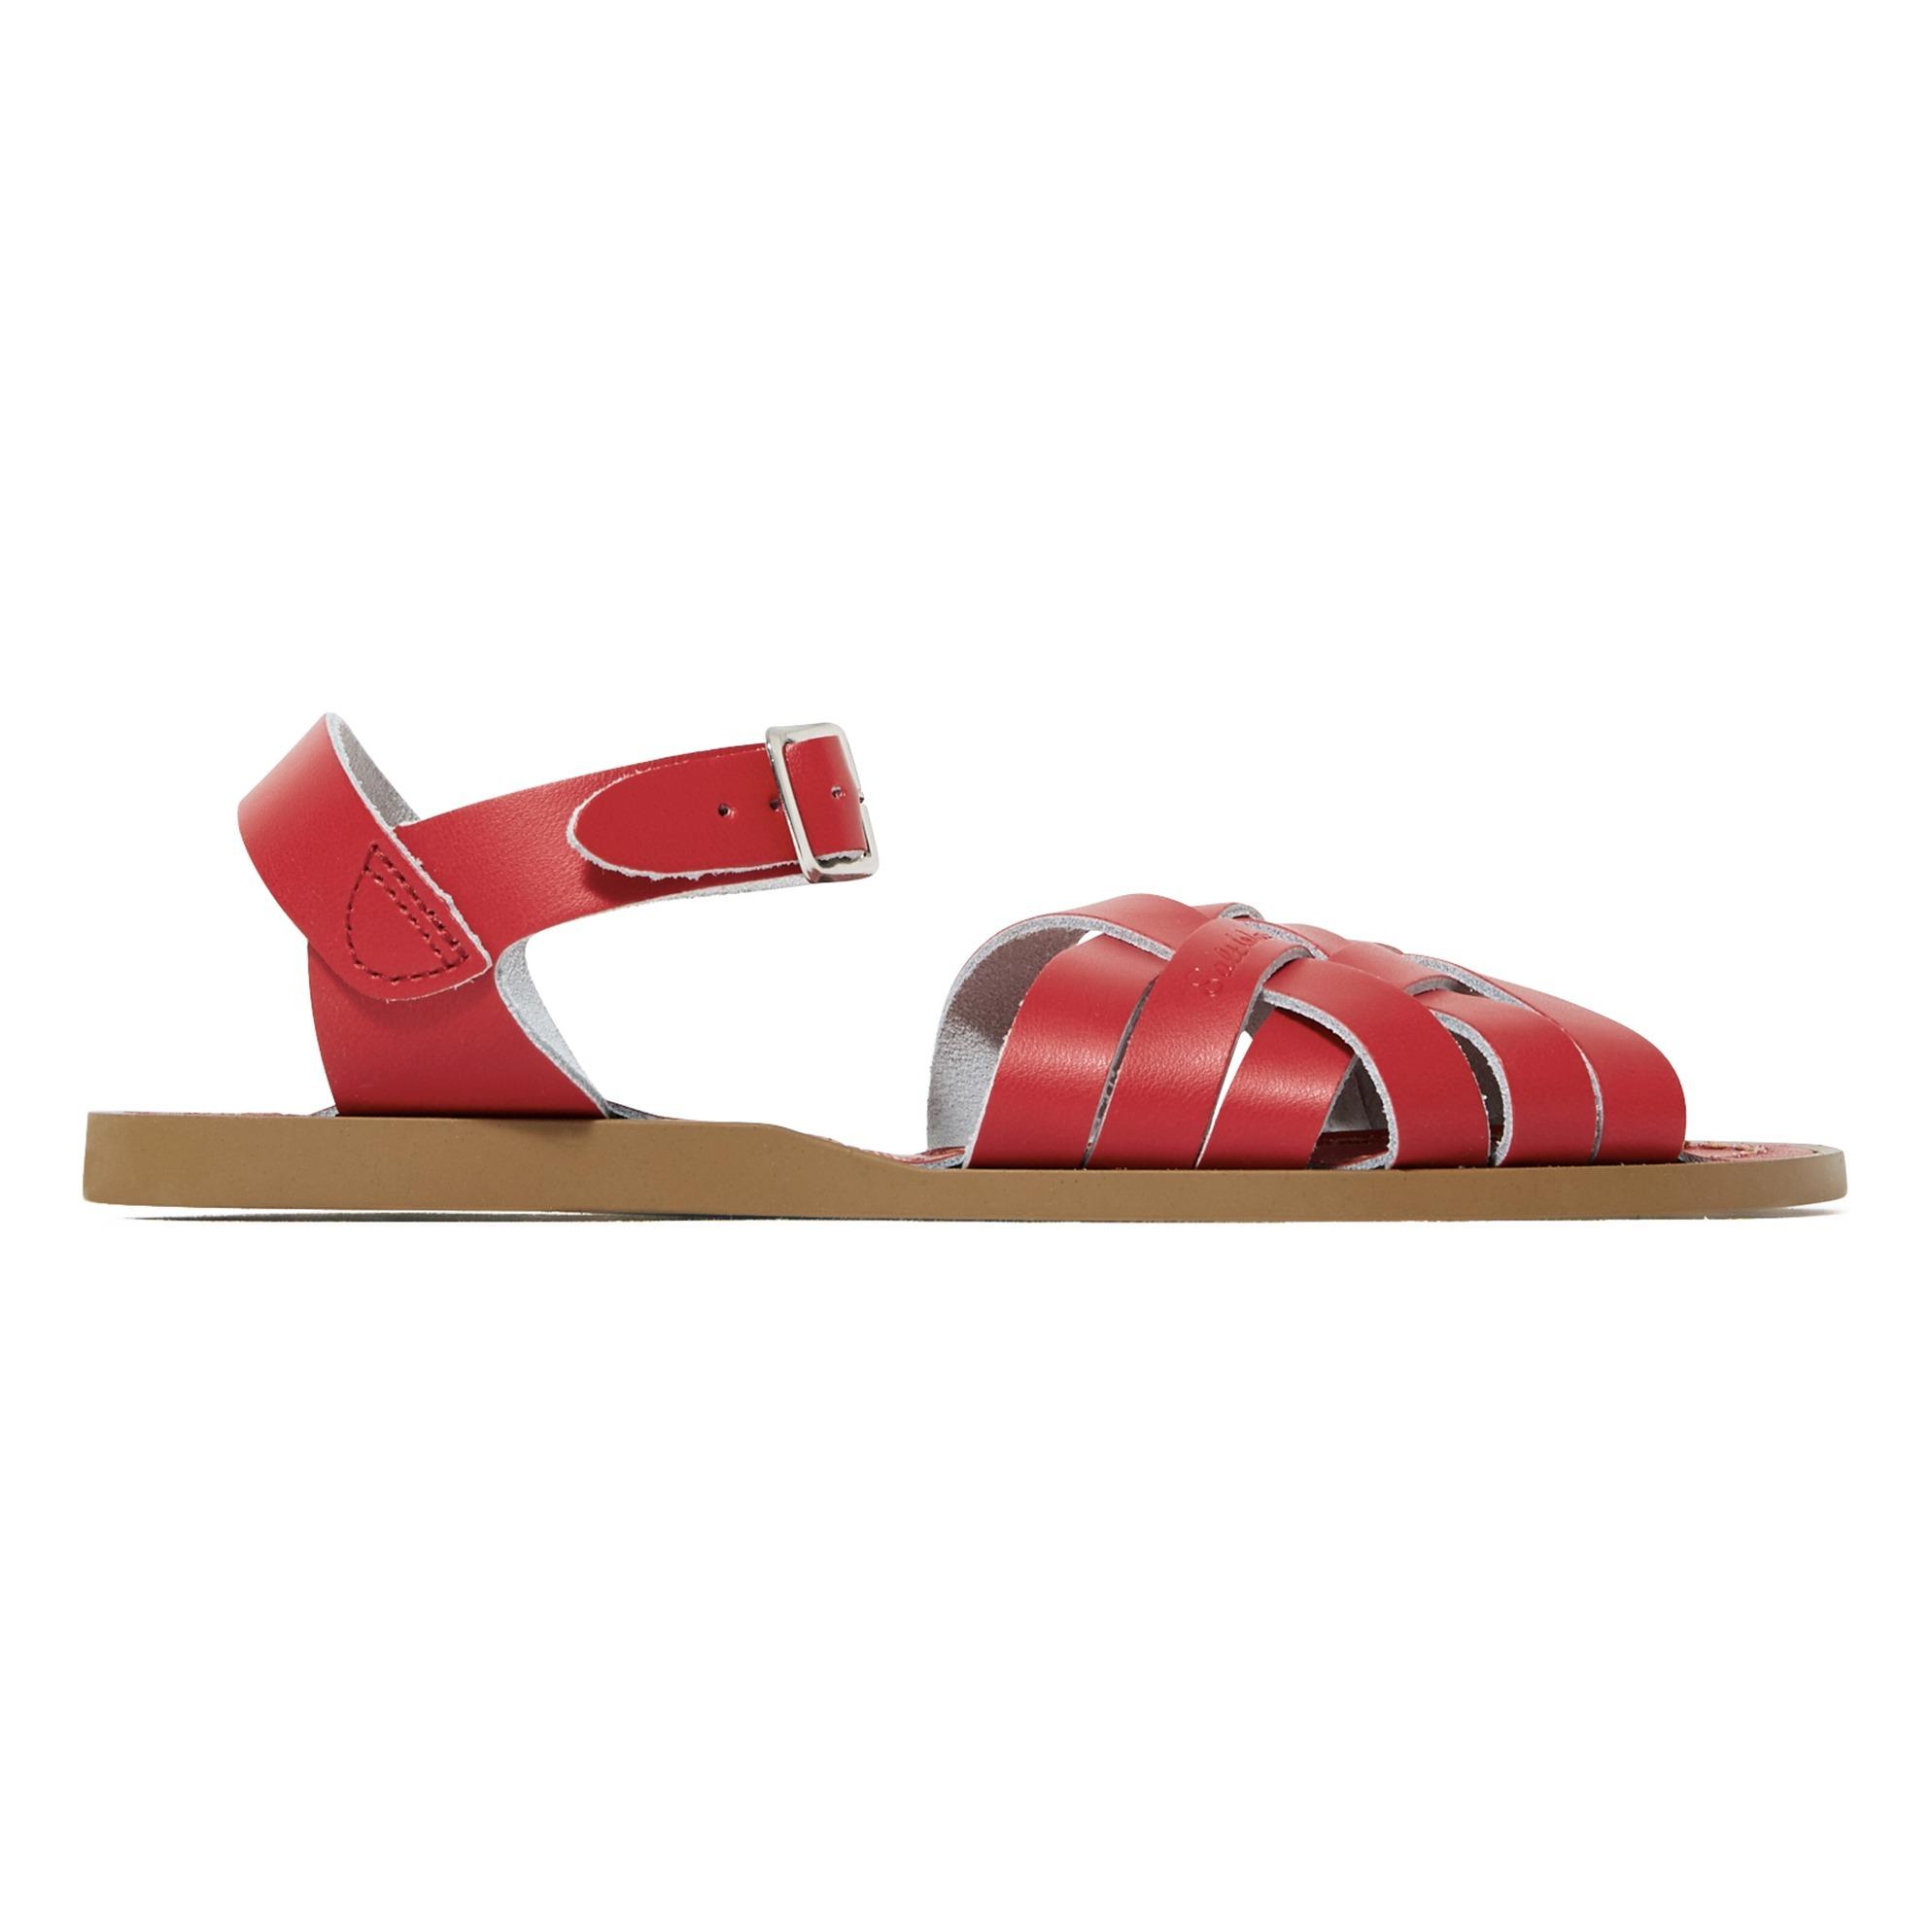 Sandales Retro - Collection Femme -